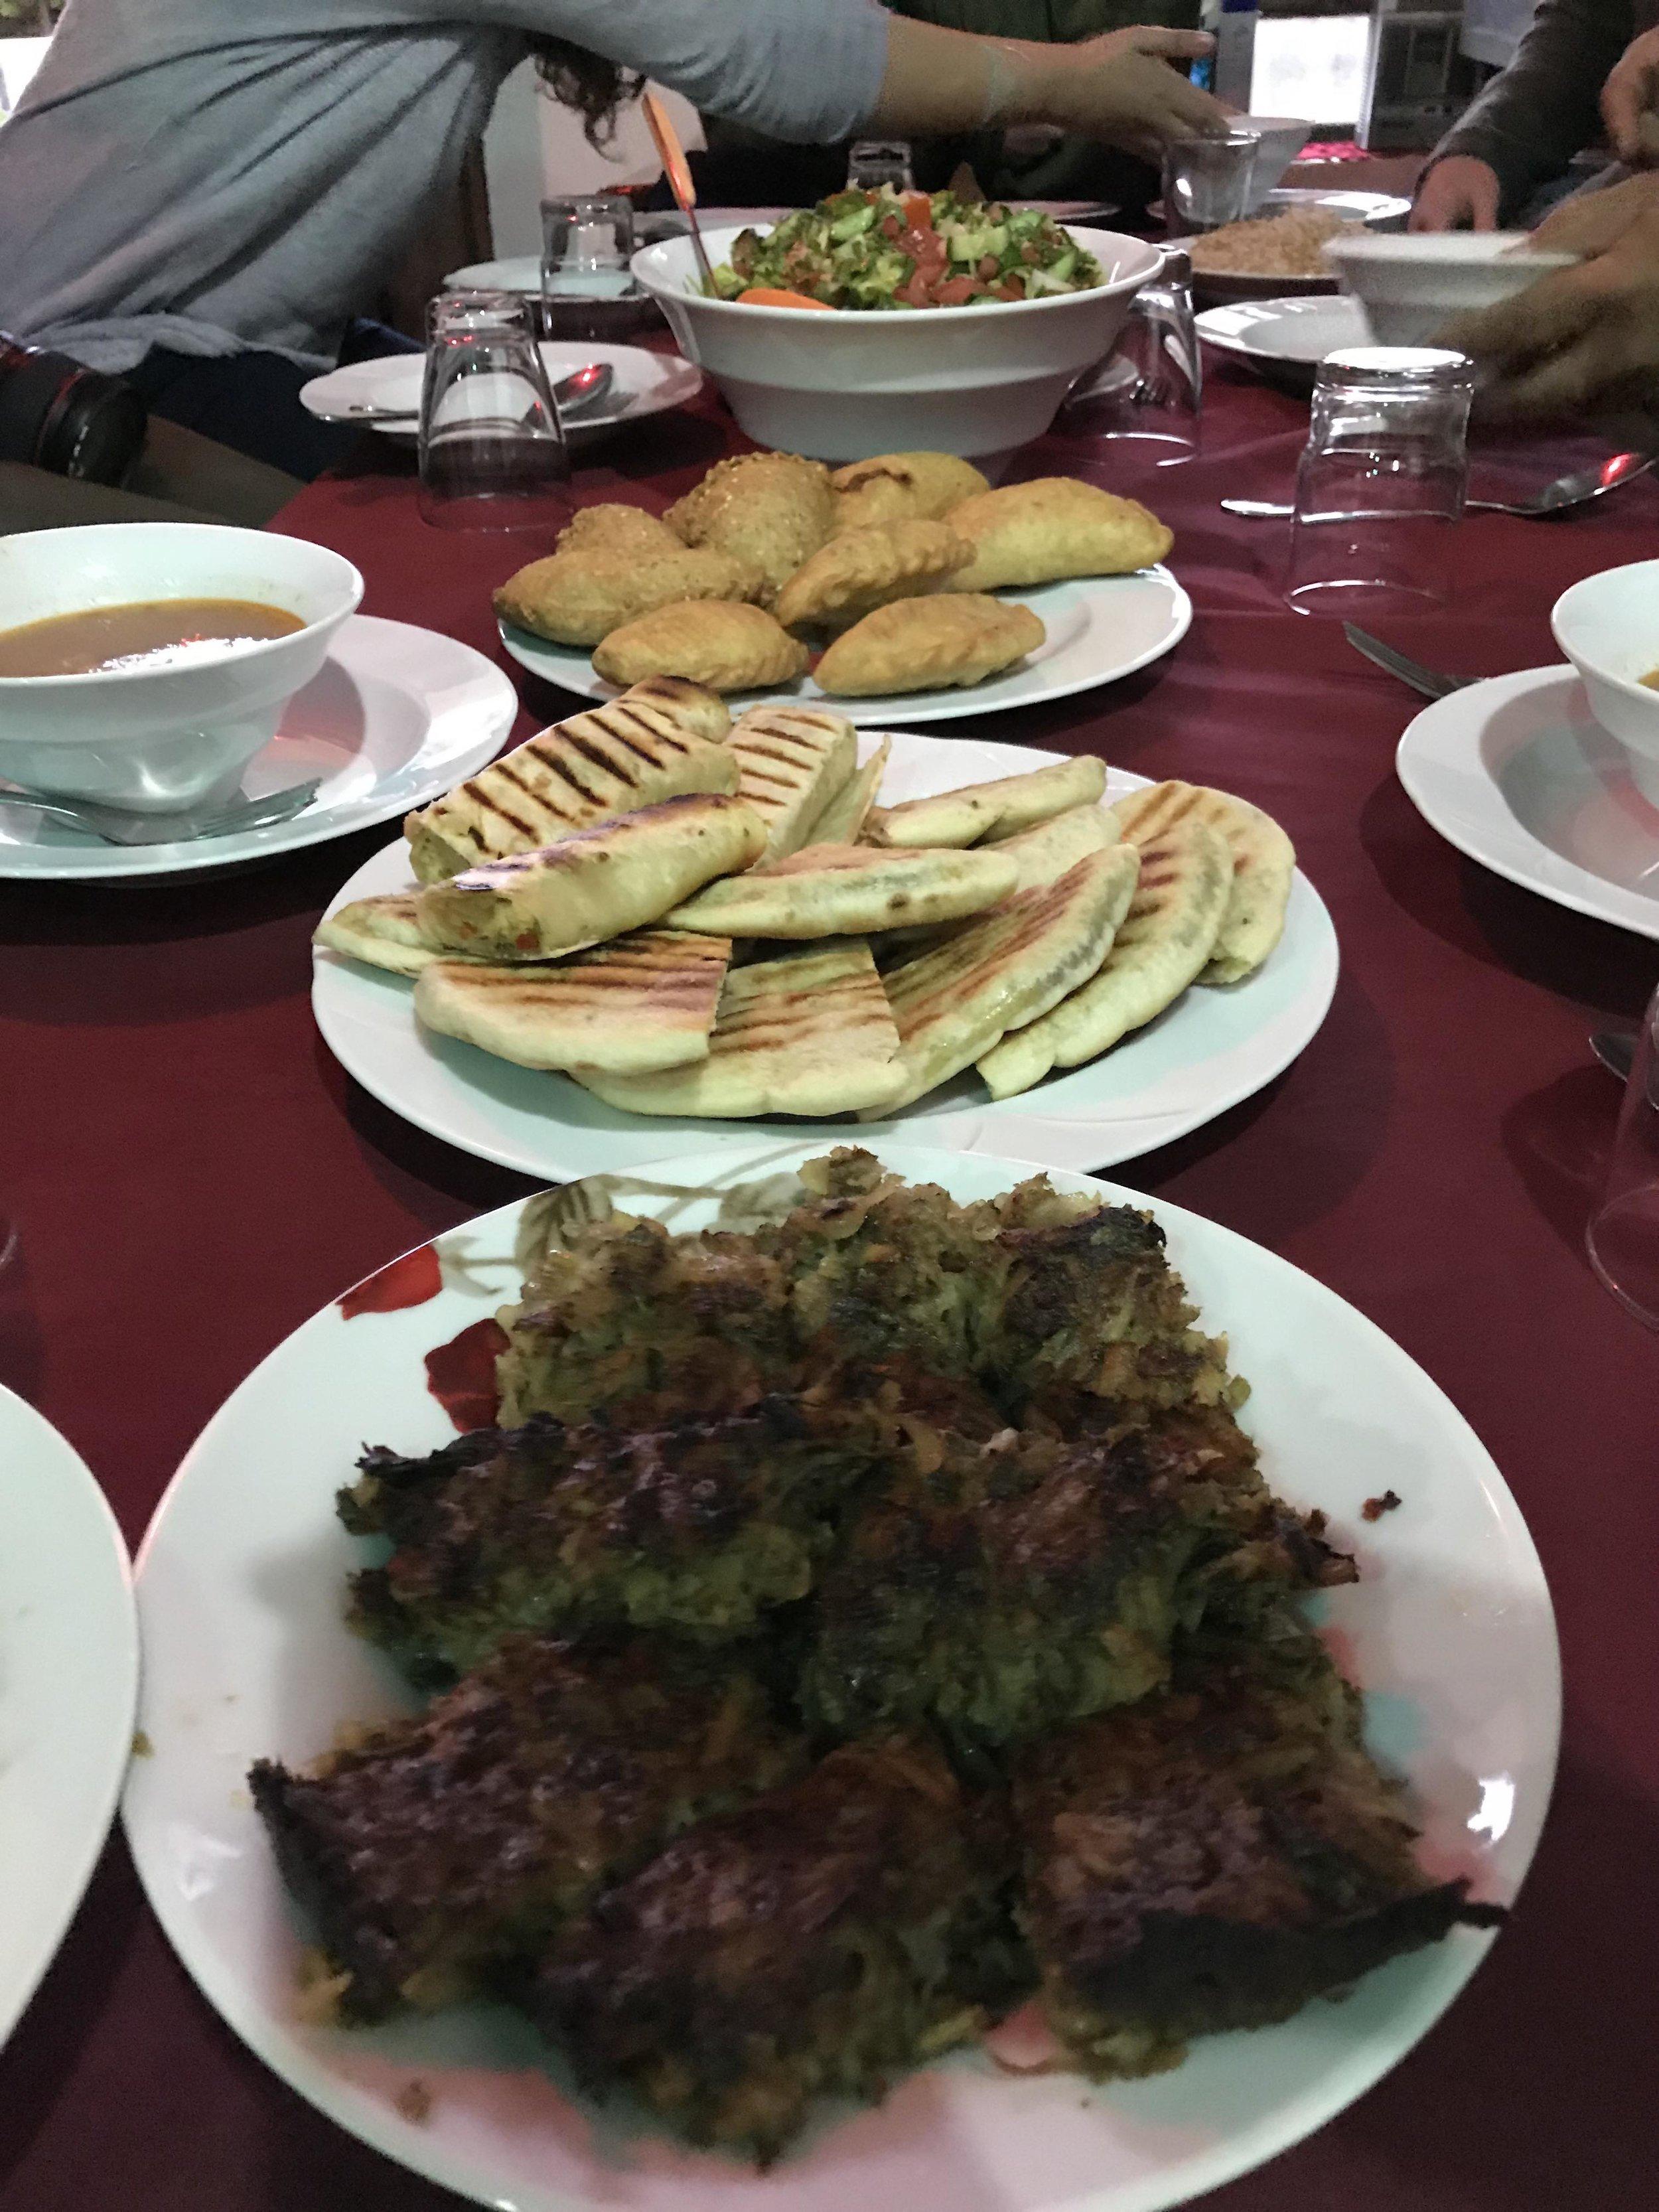 IMG_0827 lower quality druze food.jpg